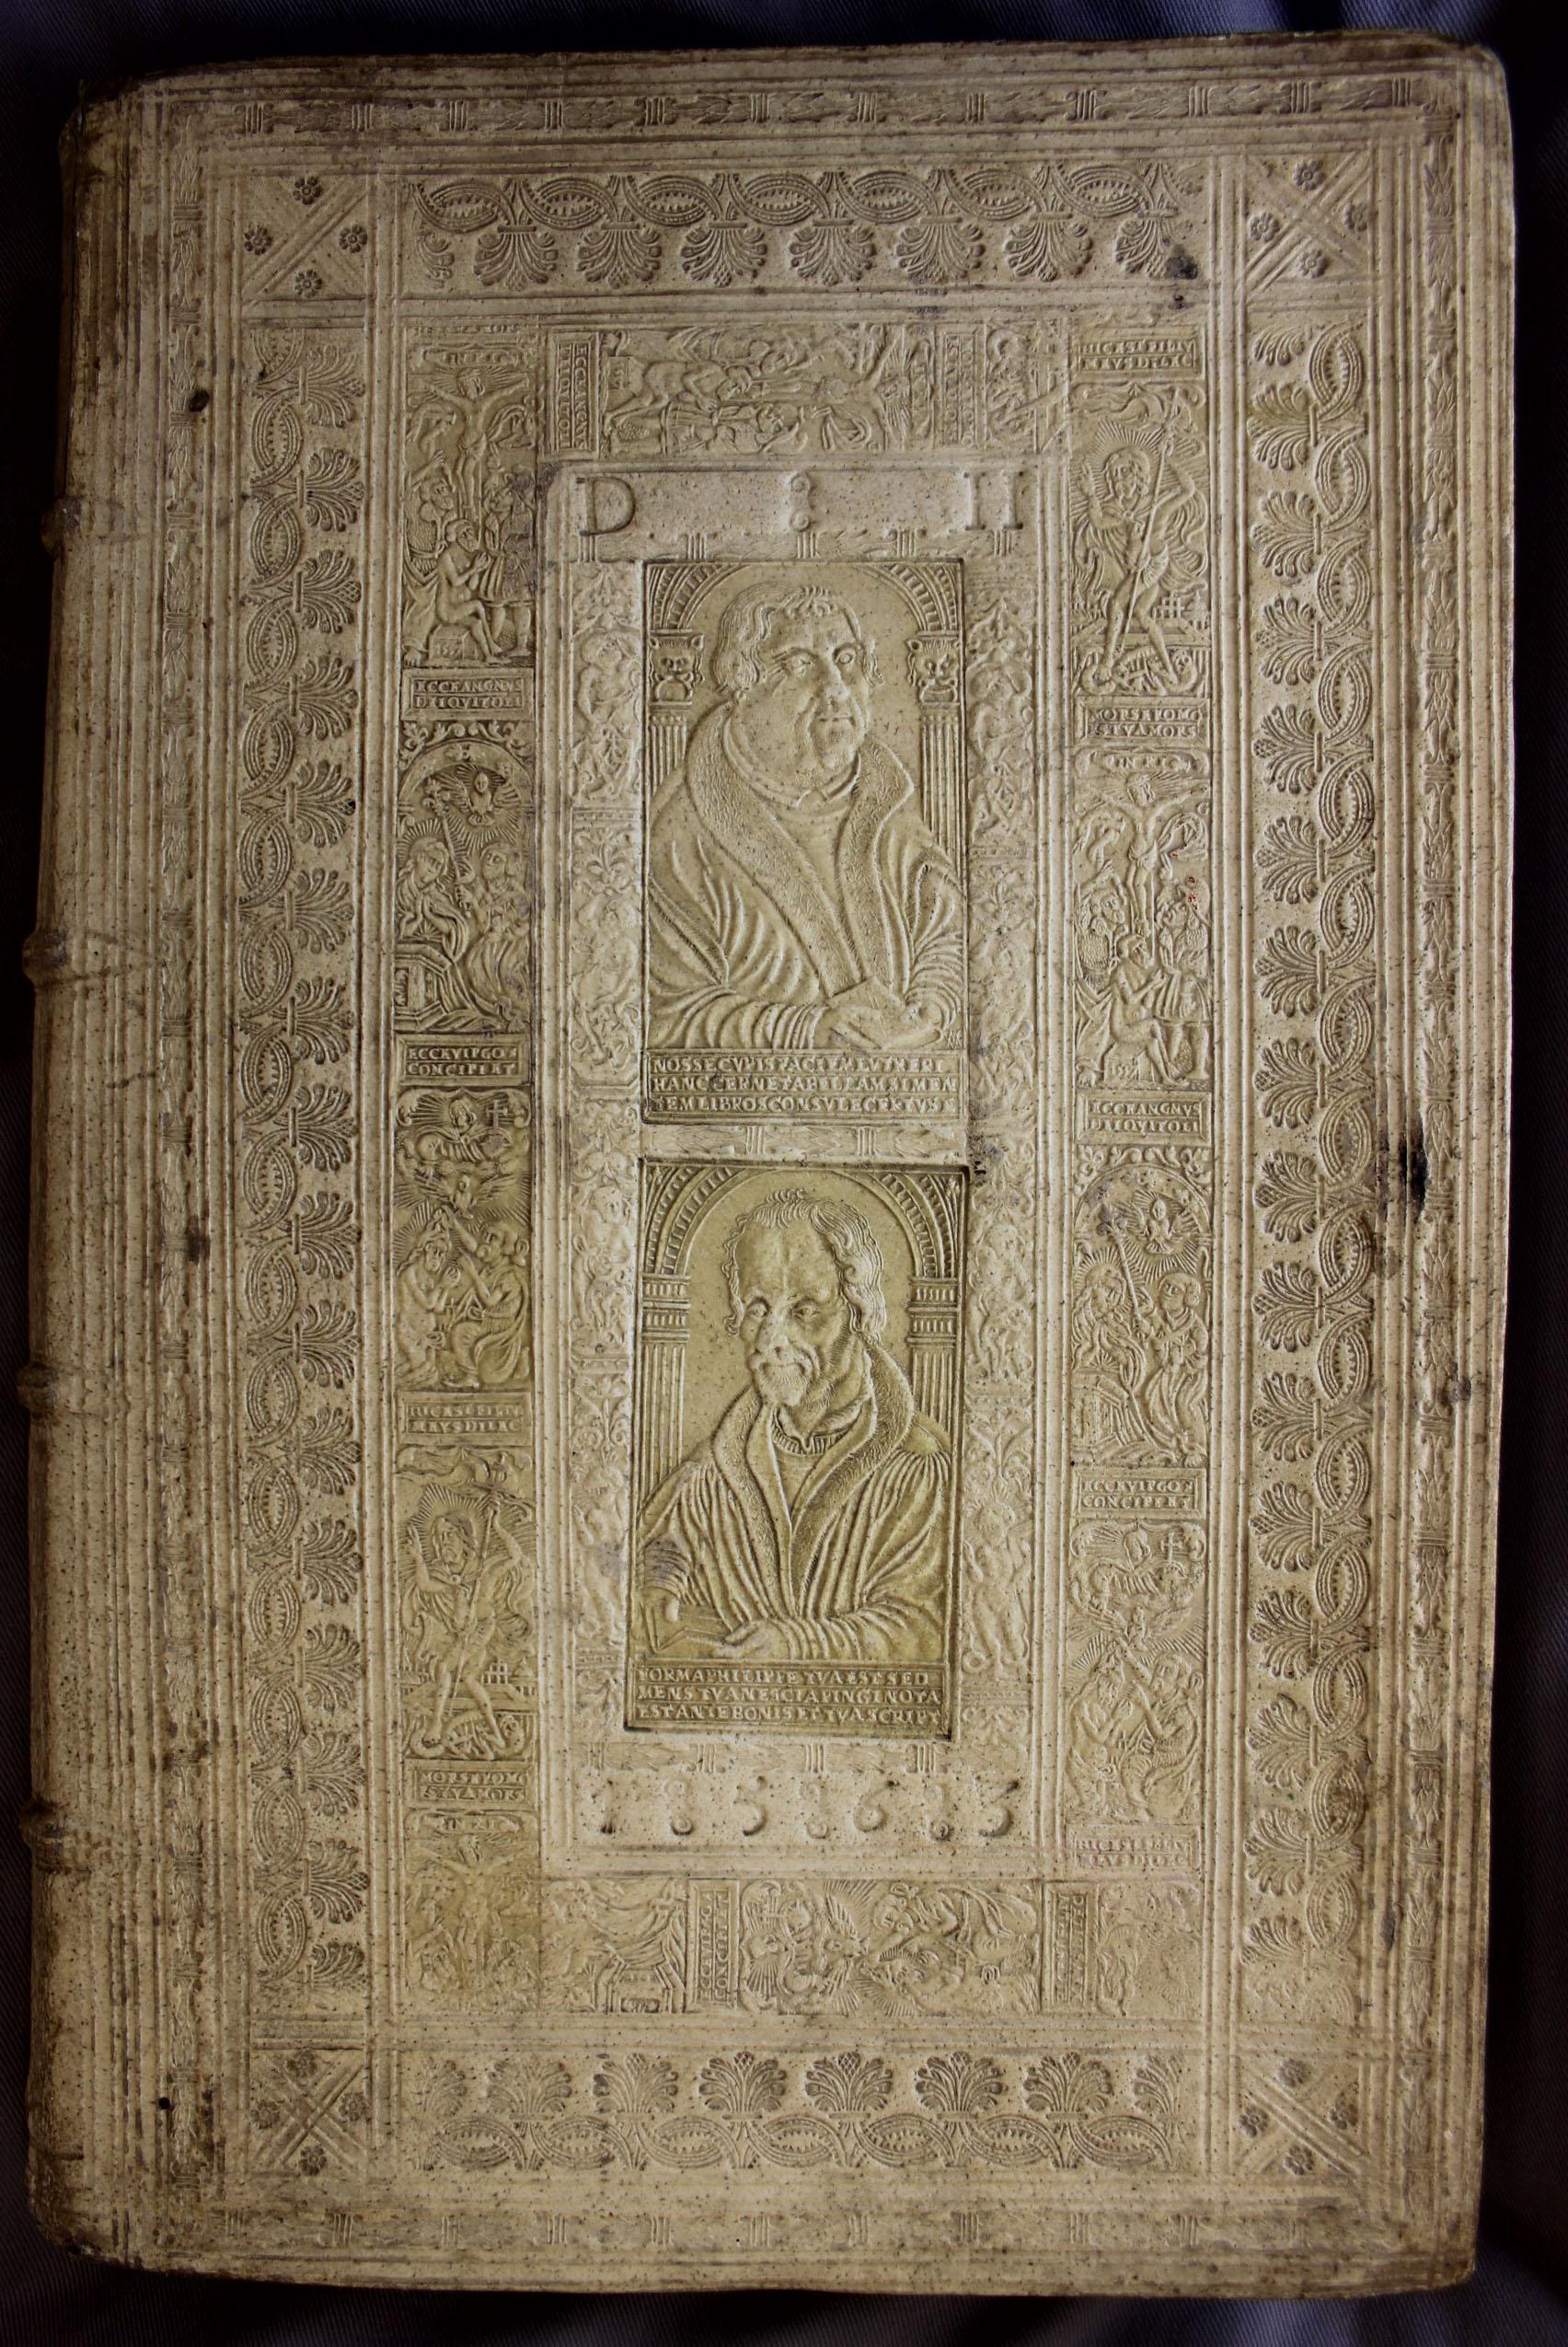 [Hērodotou Logoi ennea hoiper epikalountai Mousai] = Herodoti libri nouem, quibus musarum indita sunt nomina